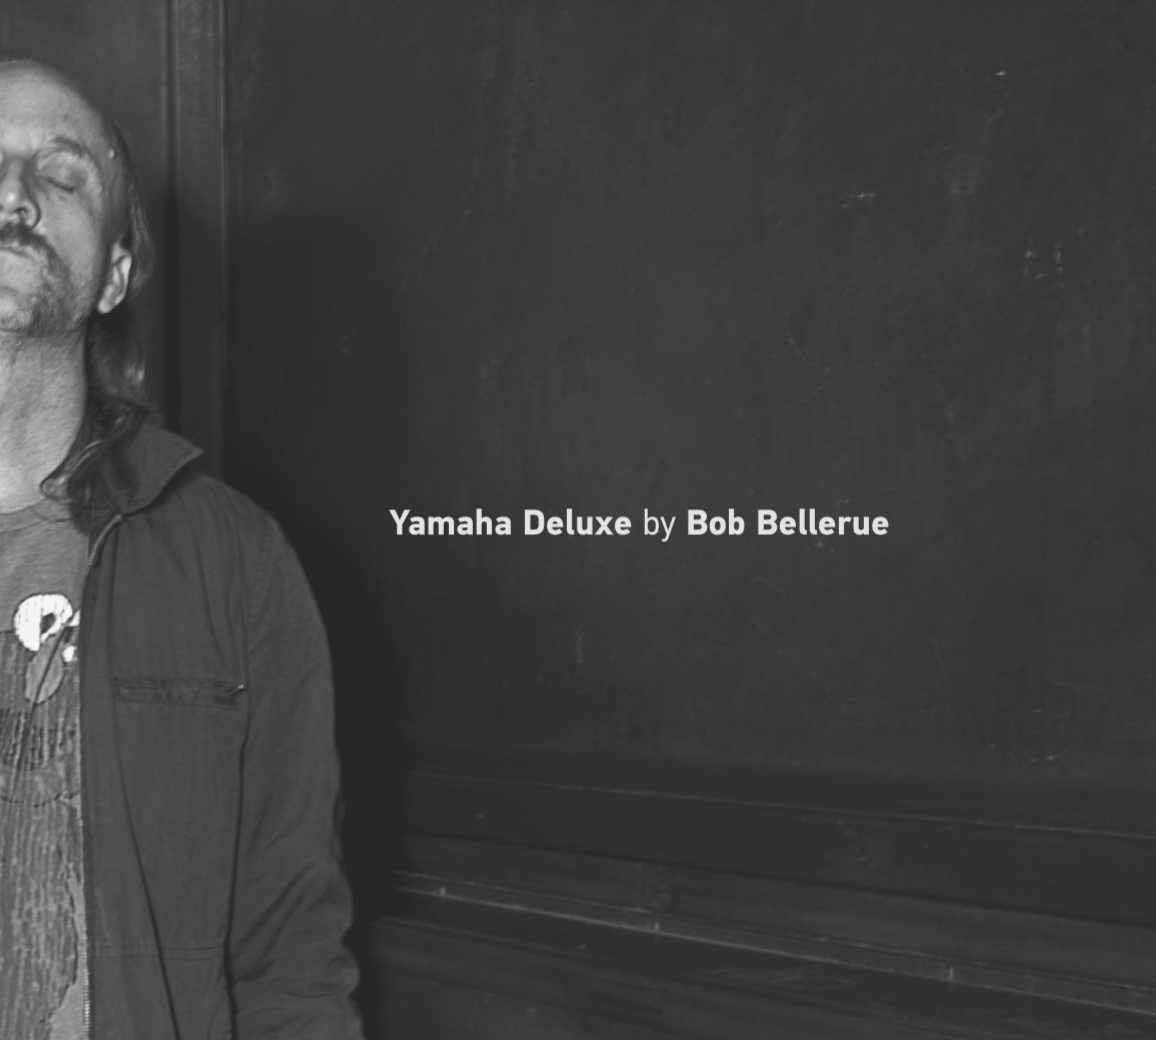 bob bellerue - Yamaha Deluxe (2CD)